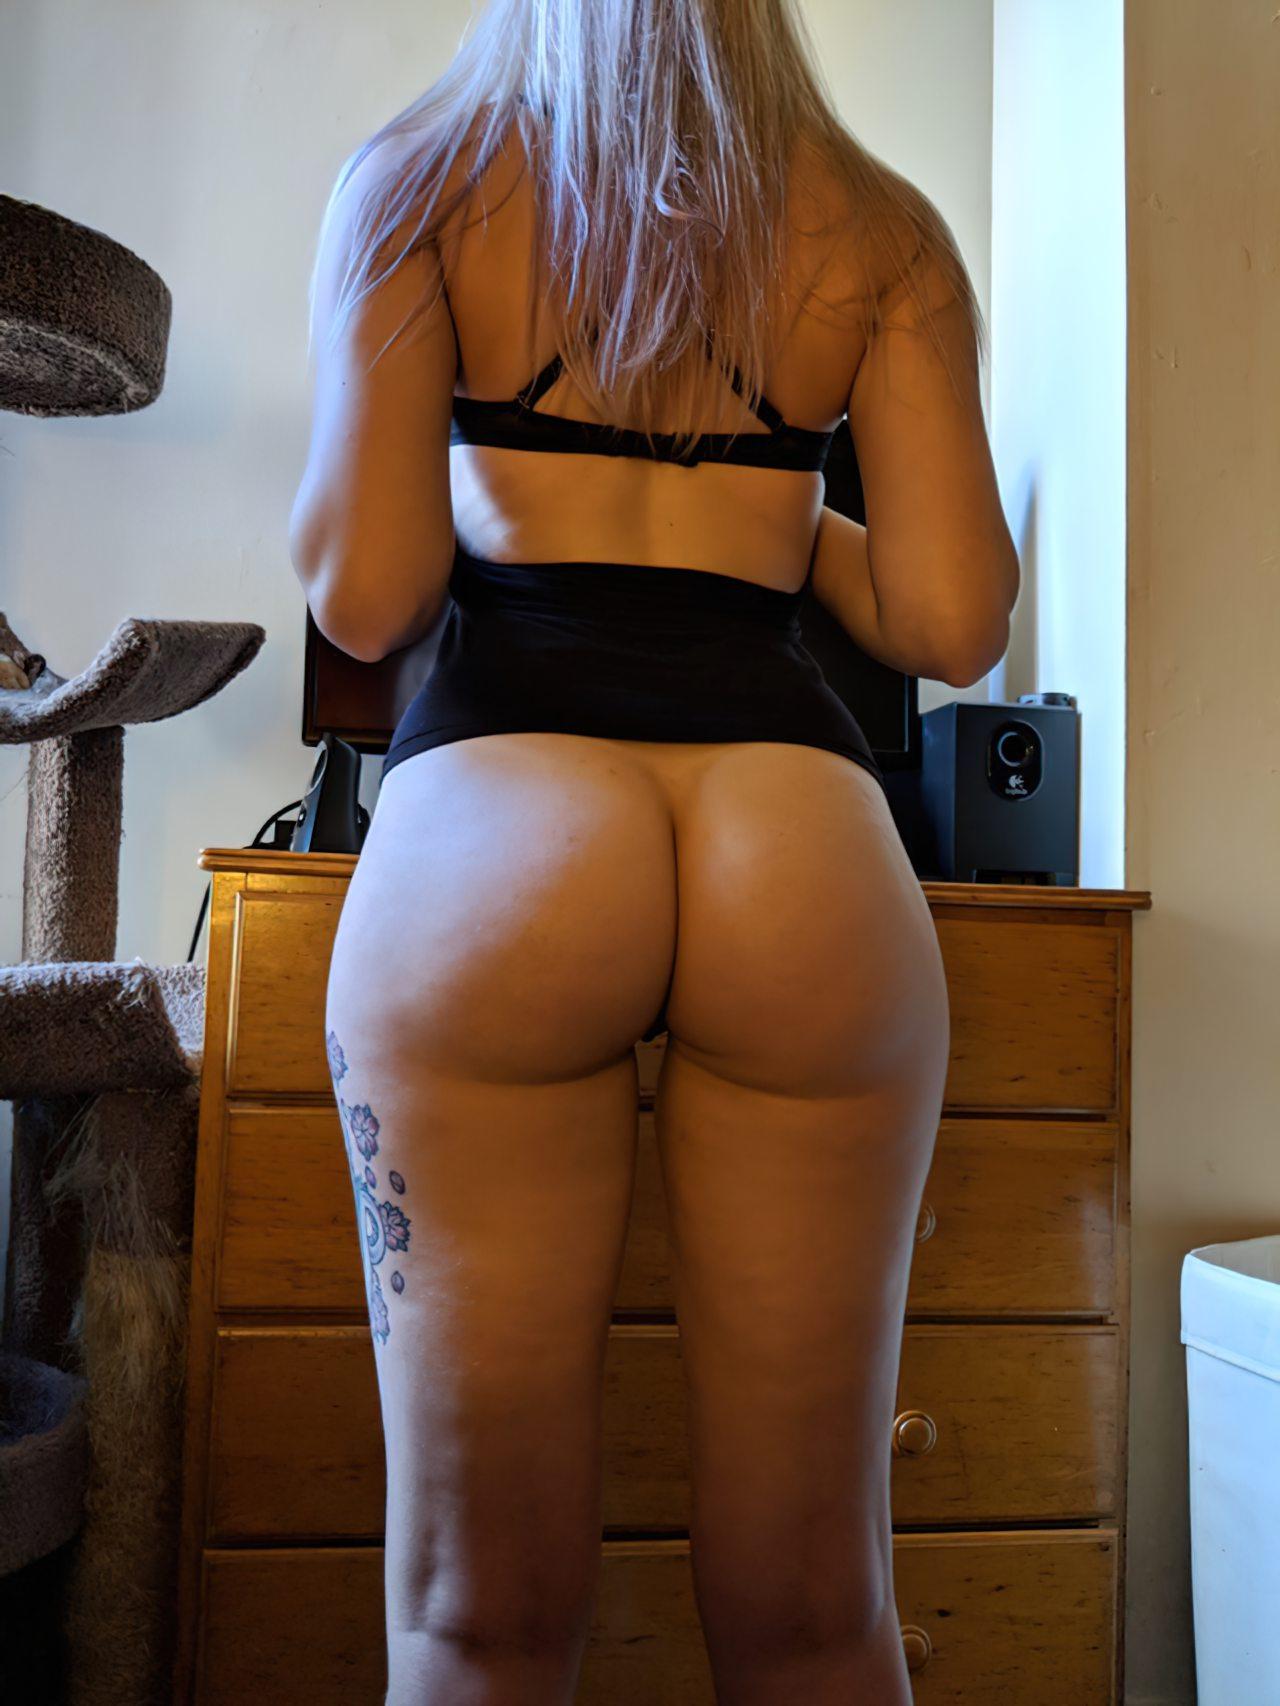 Fotos Sexo Nudes Loira Anonima (11)